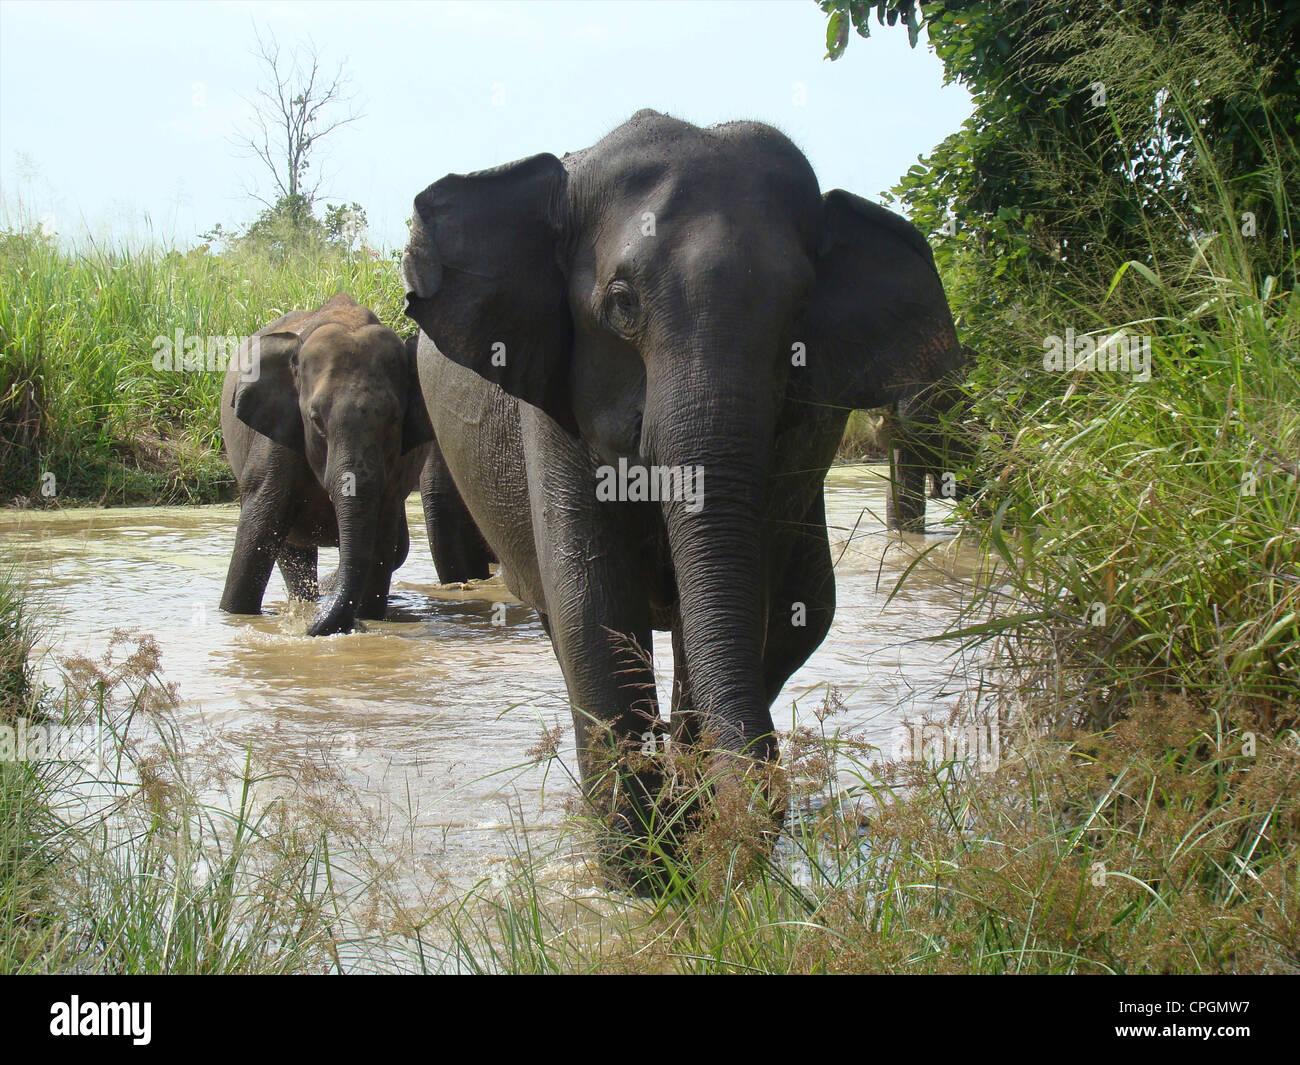 L'éléphant d'Asie, Elephas maximus maximus, Parc National d'Uda Walawe, Sri Lanka, Asie Photo Stock